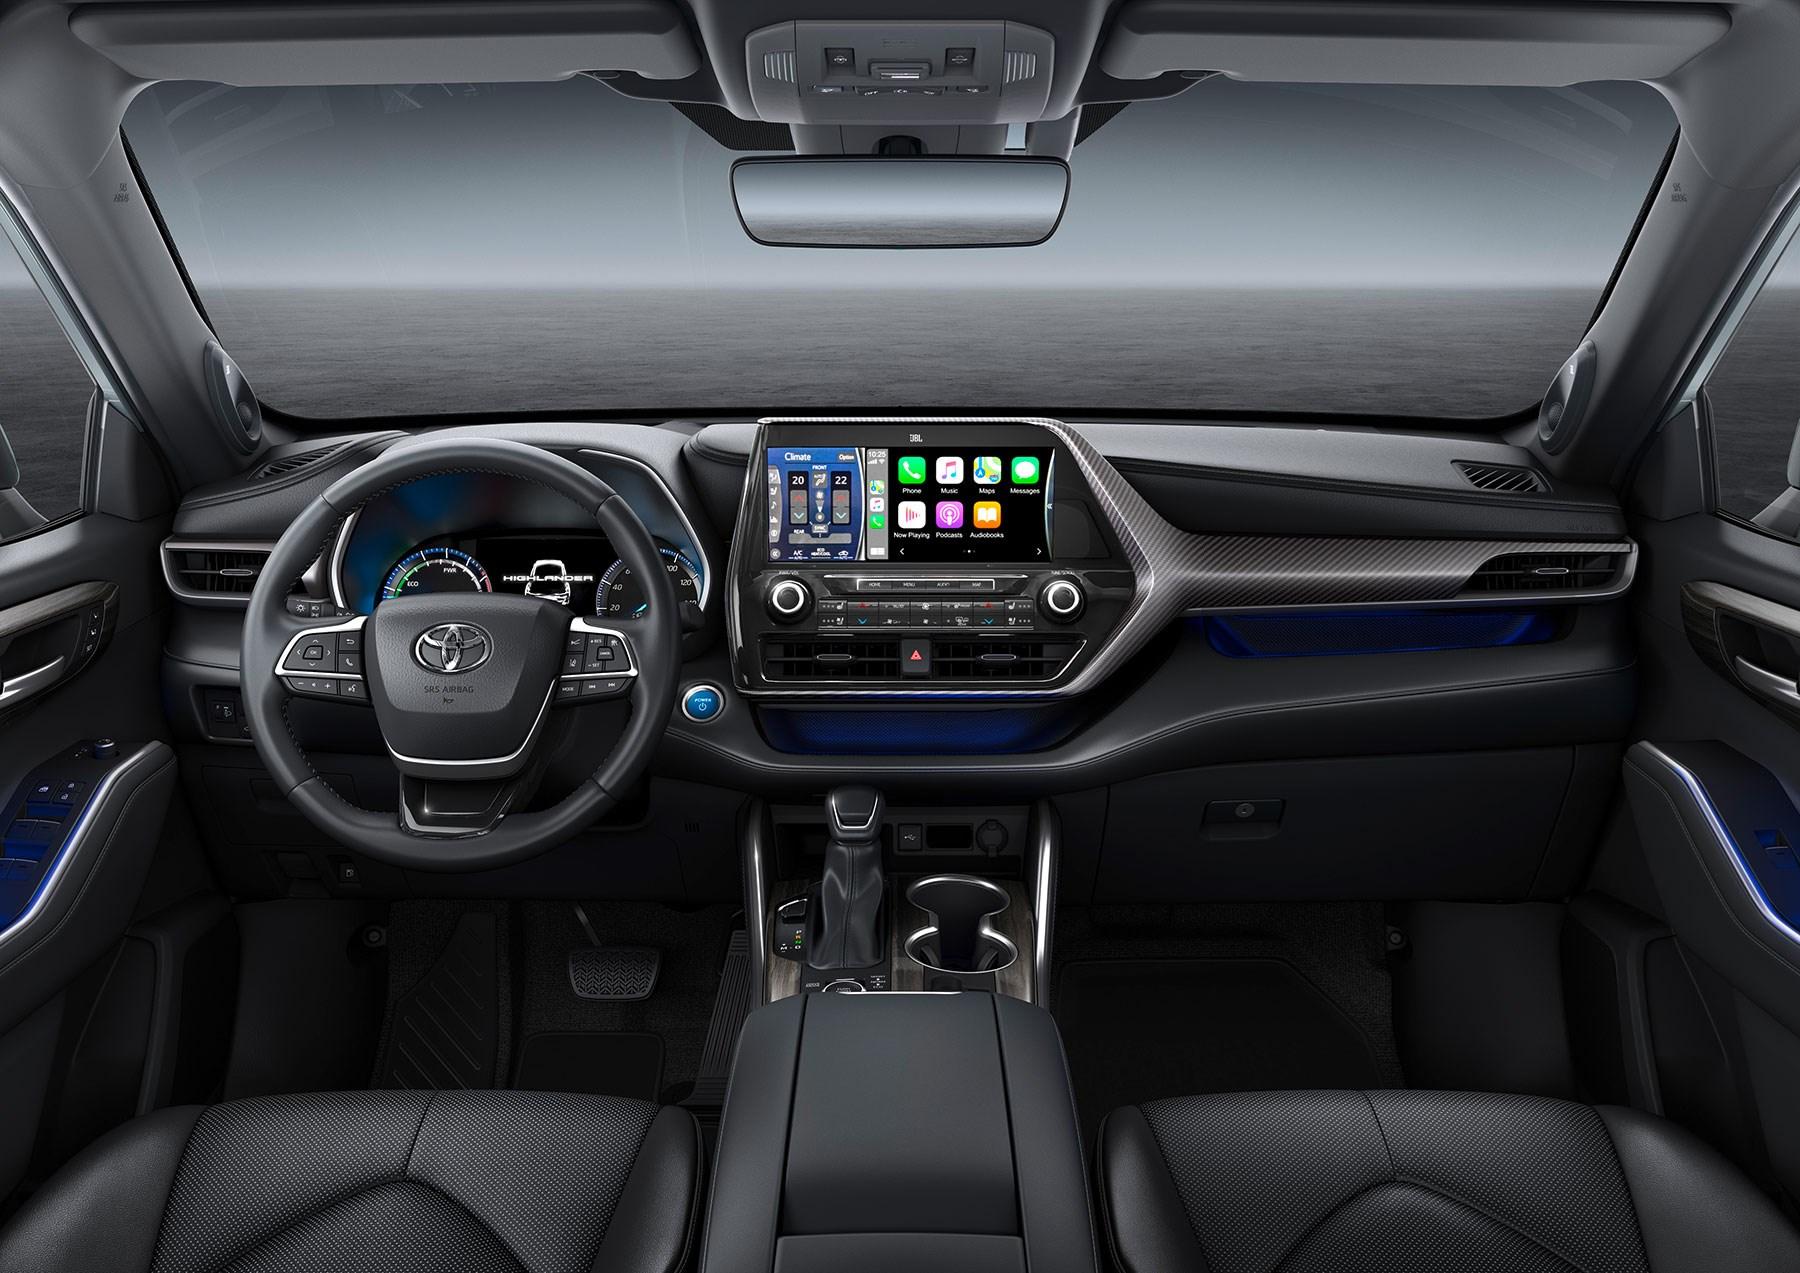 Toyota Highlander Seven Seat Hybrid Suv Confirmed For Uk Sale In 2021 Car Magazine